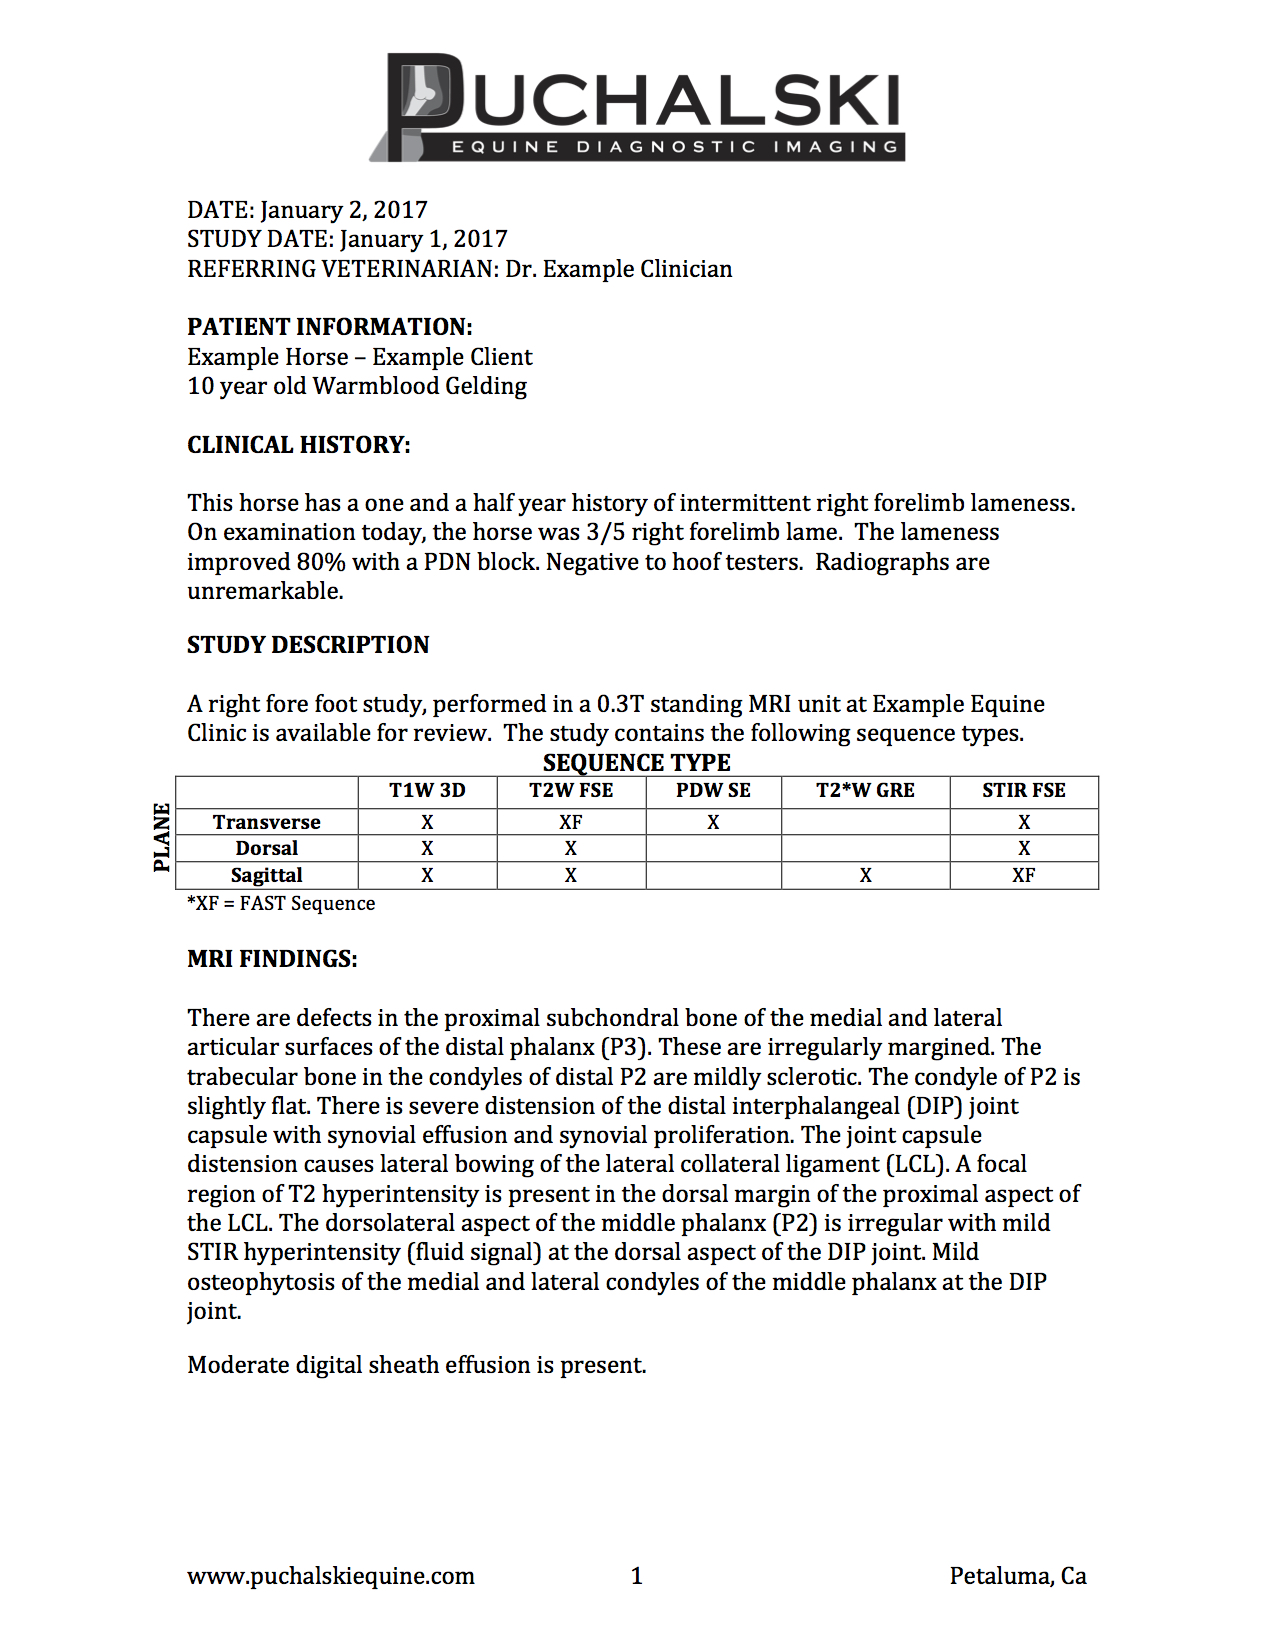 Radiologist's Report